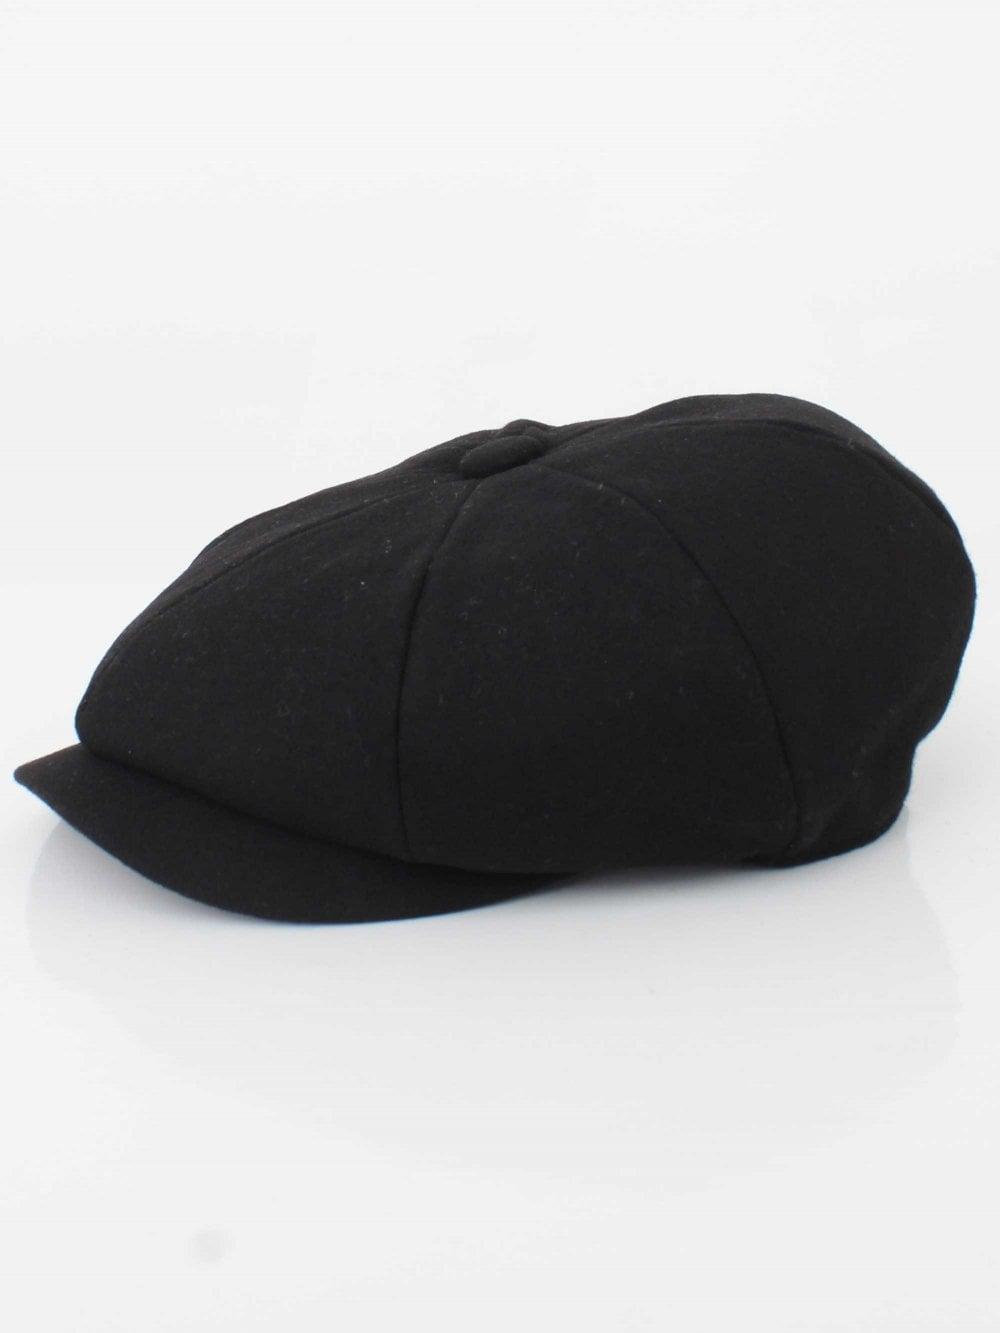 Barbour Melton Bakerboy Cap in Black  21ccd79e98a